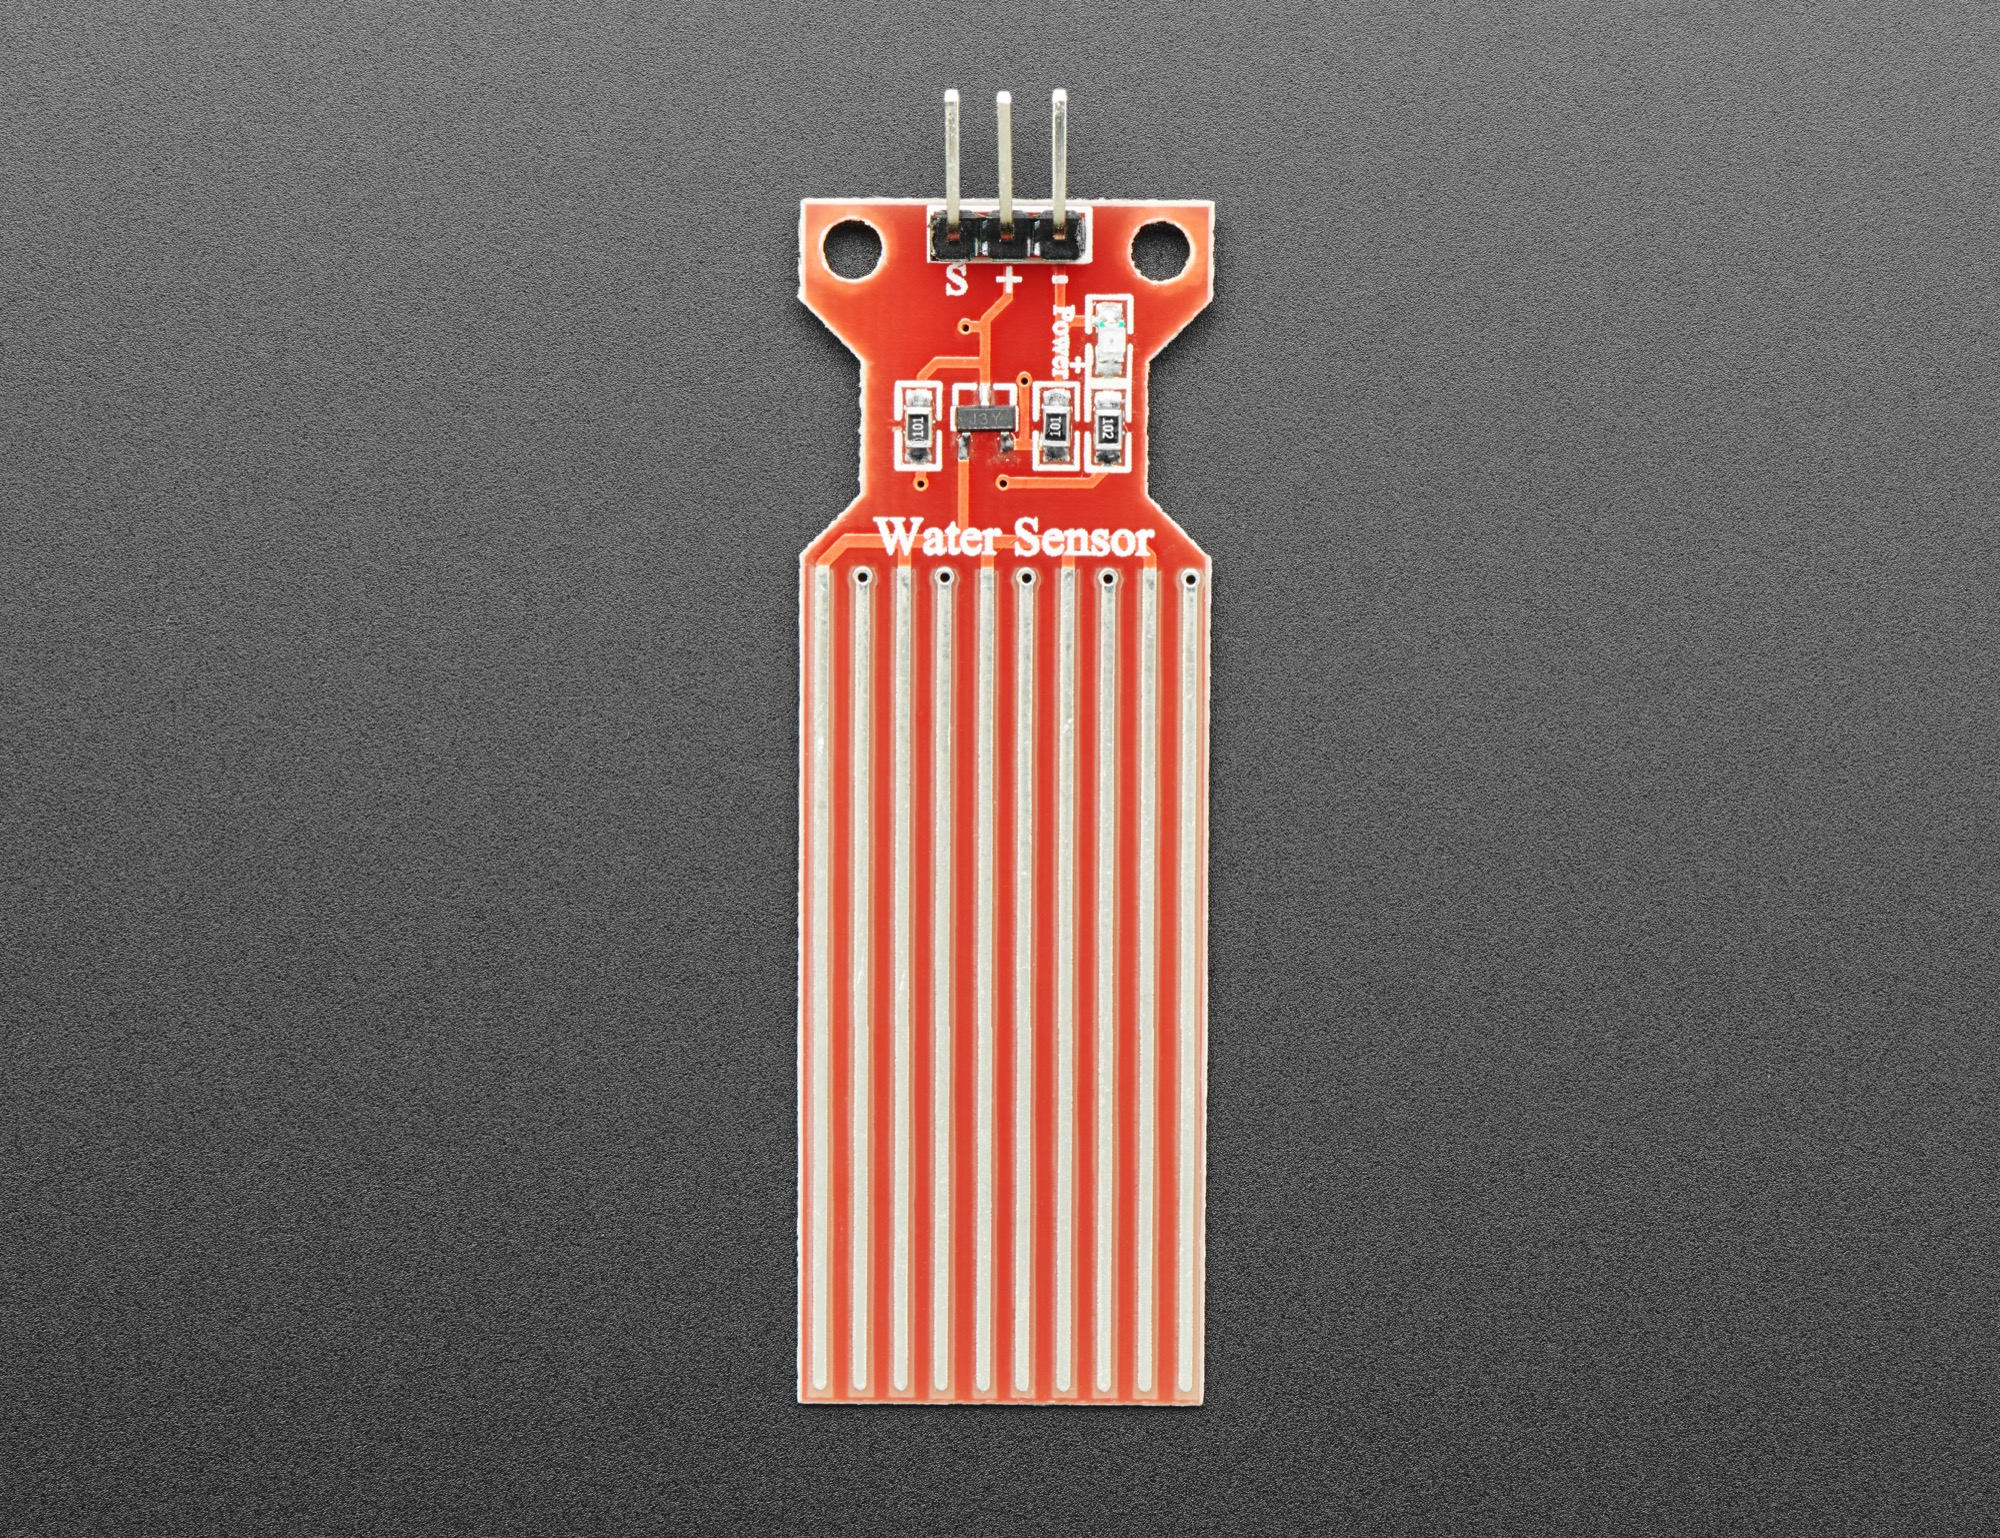 circuitpython_4965_top_2k_2021_03.jpg